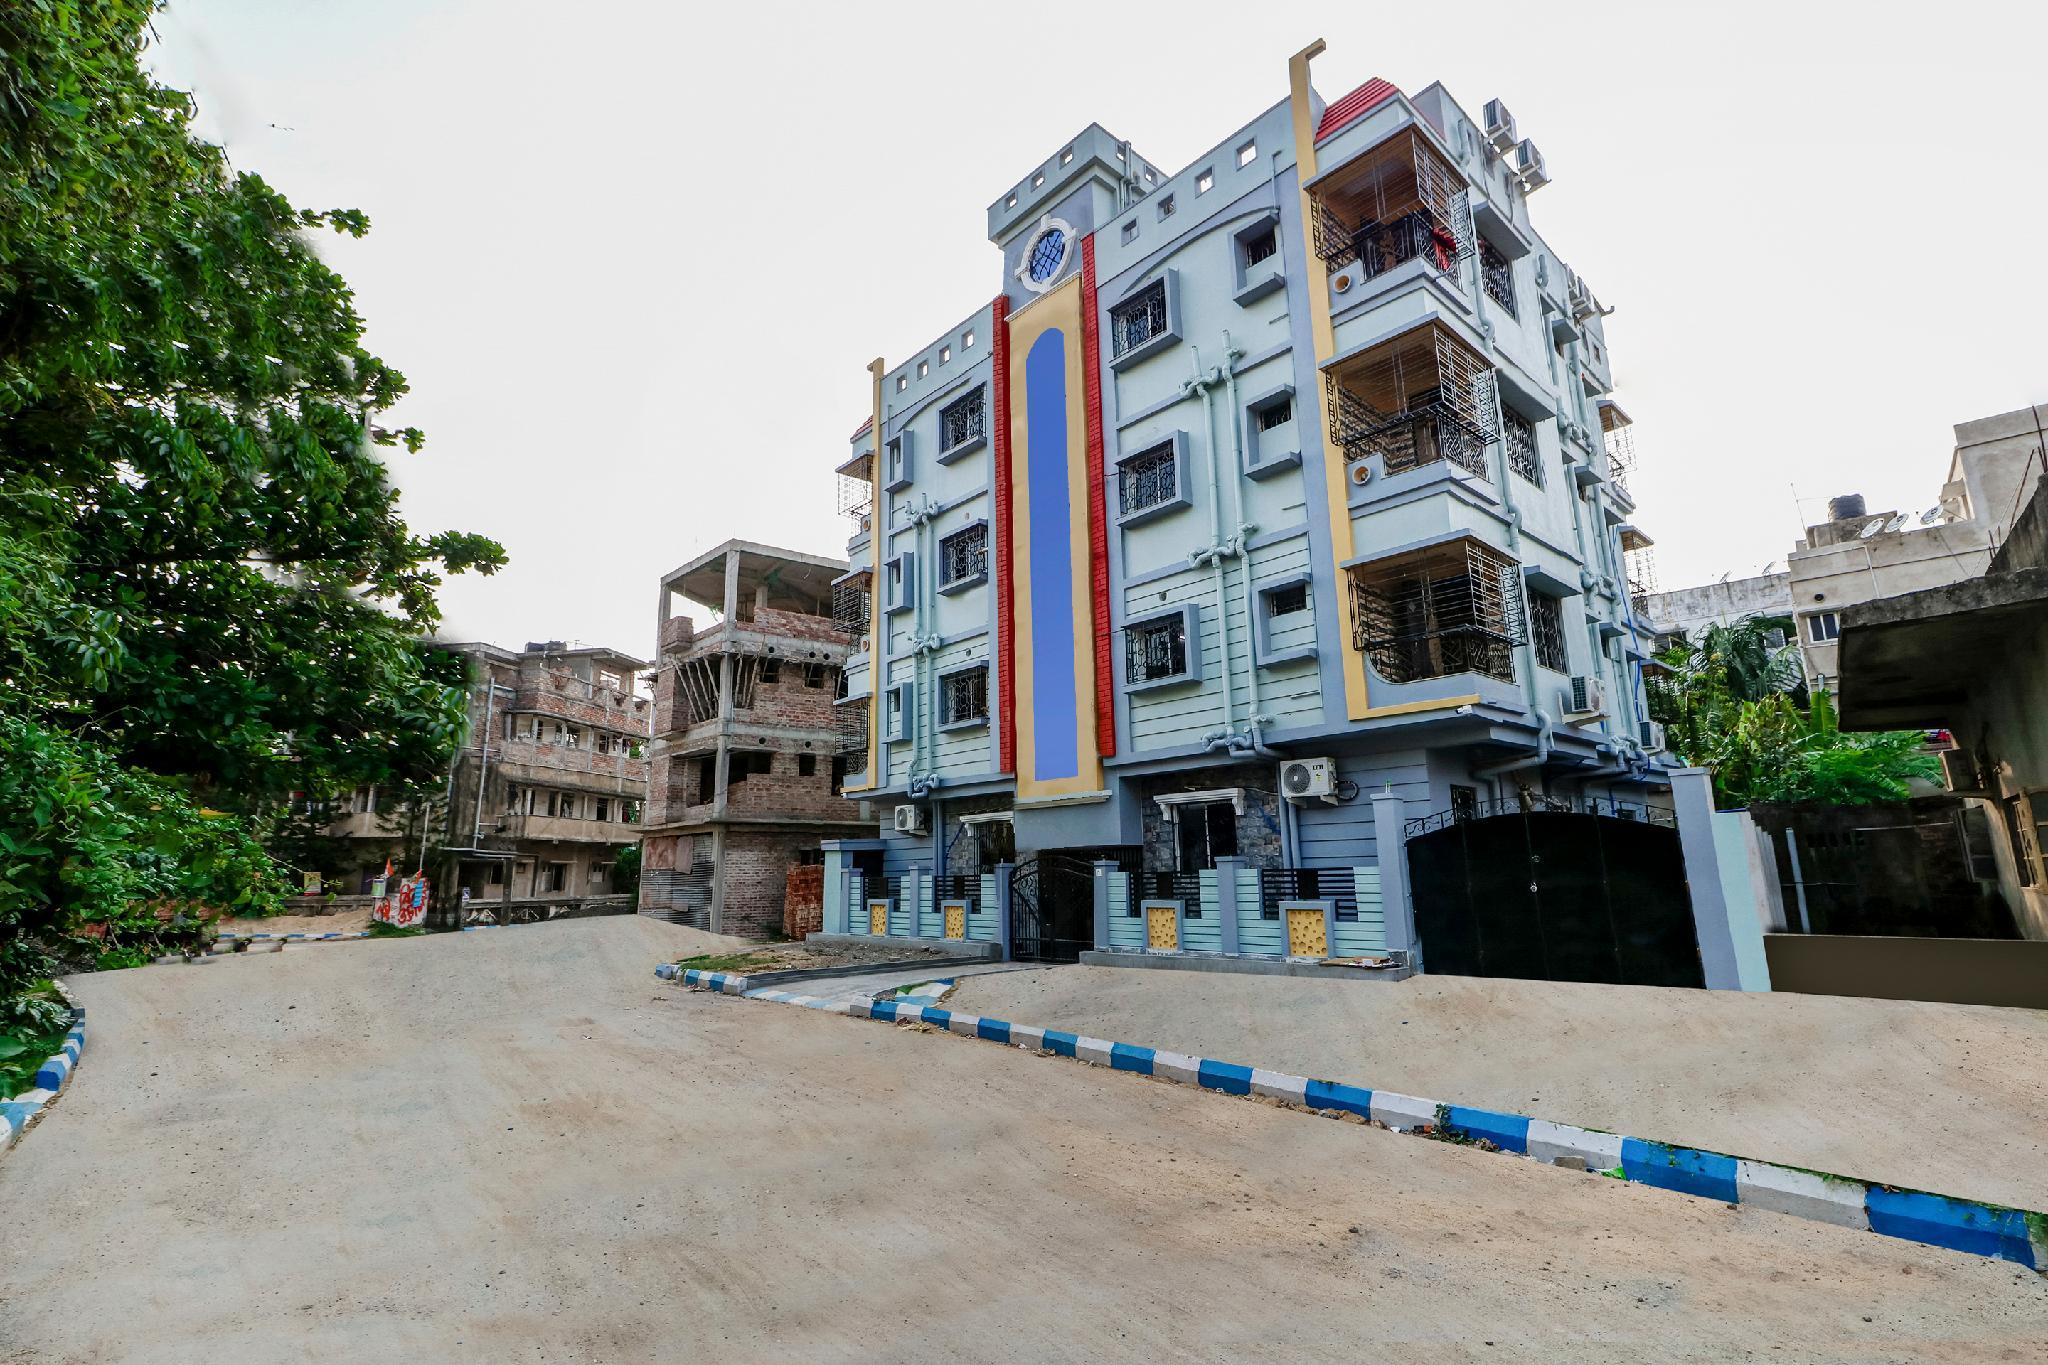 OYO 36480 Vibrant Near Medica Hospital in Kolkata